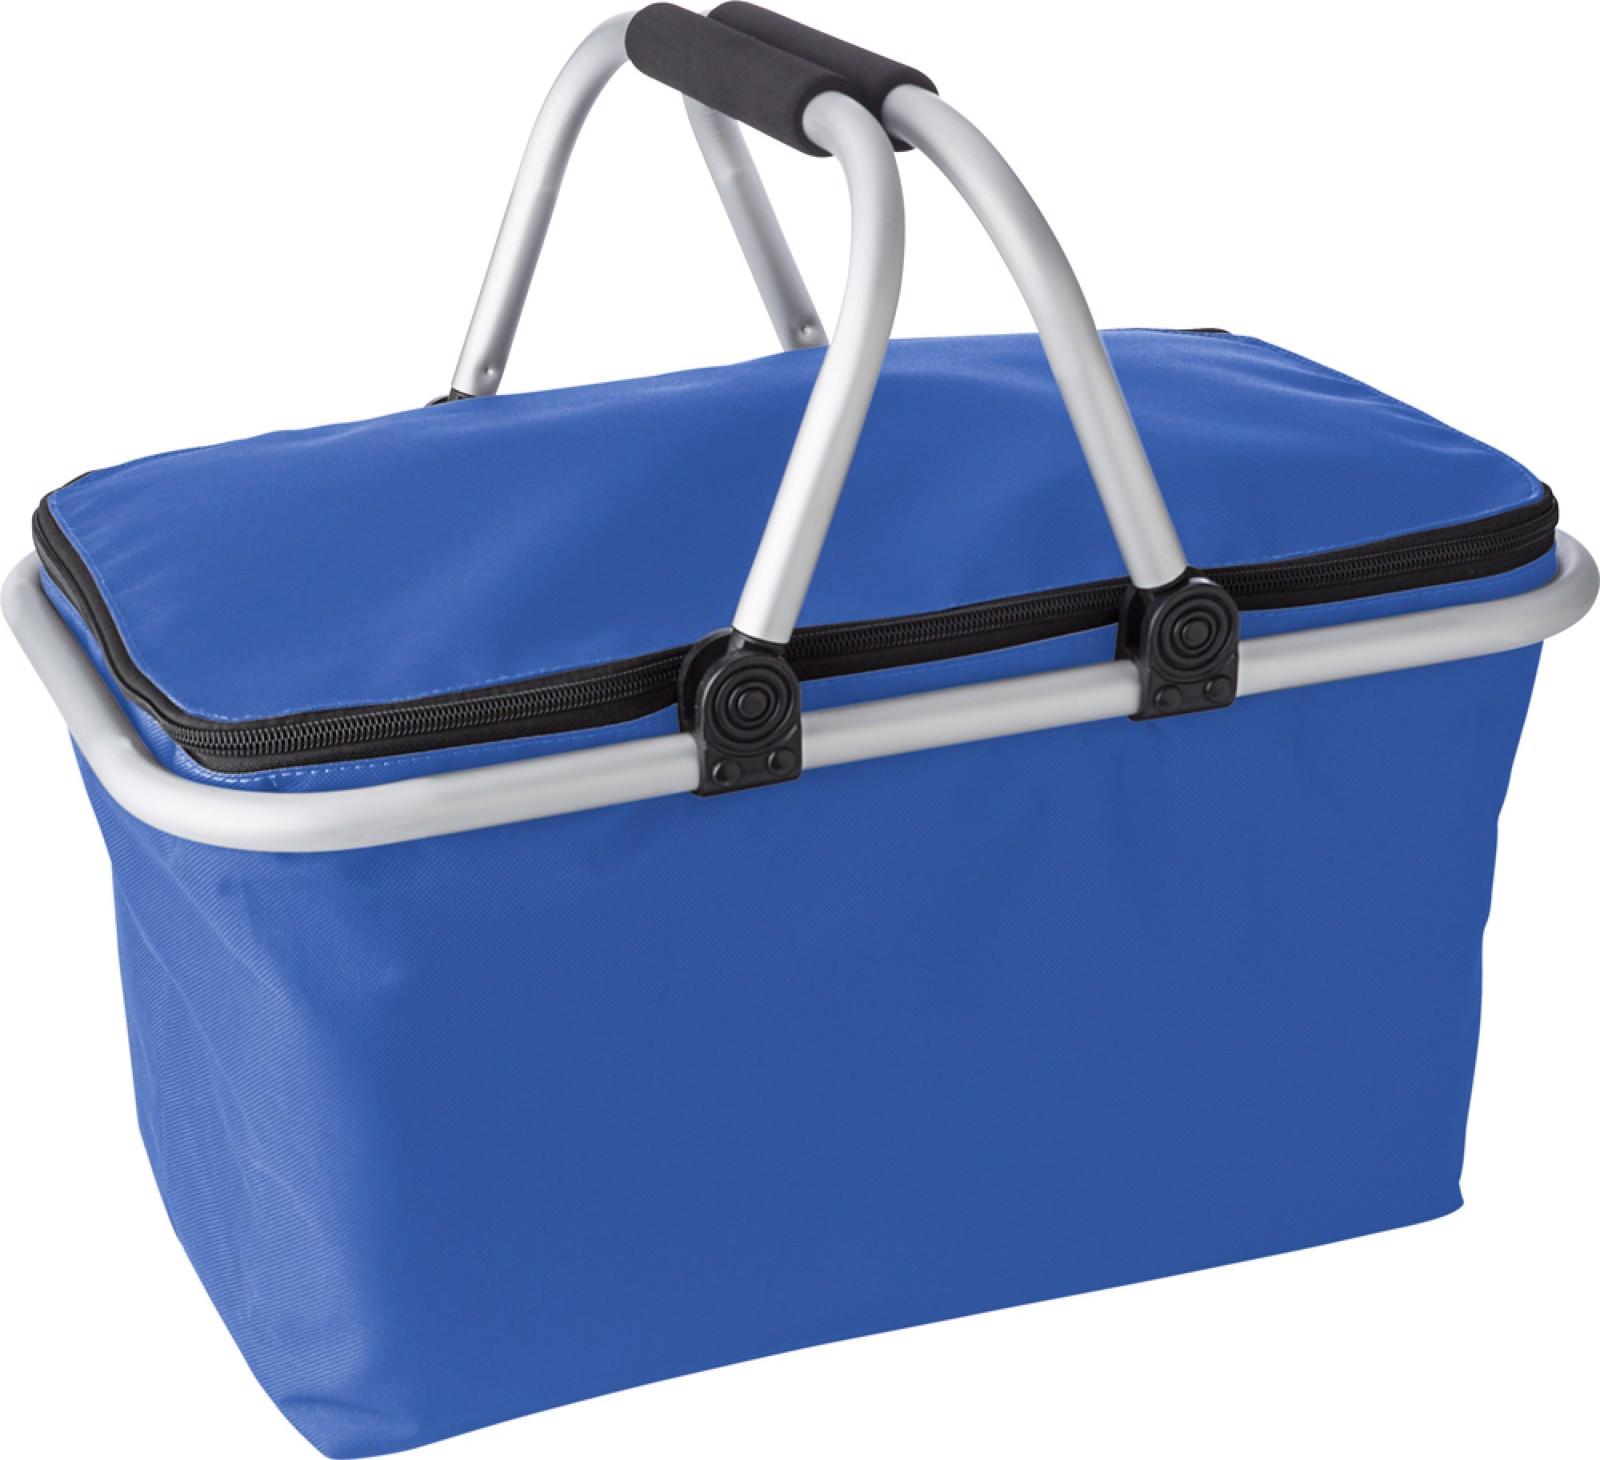 Polyester (320-330 gr/m²) shopping basket. - Cobalt Blue